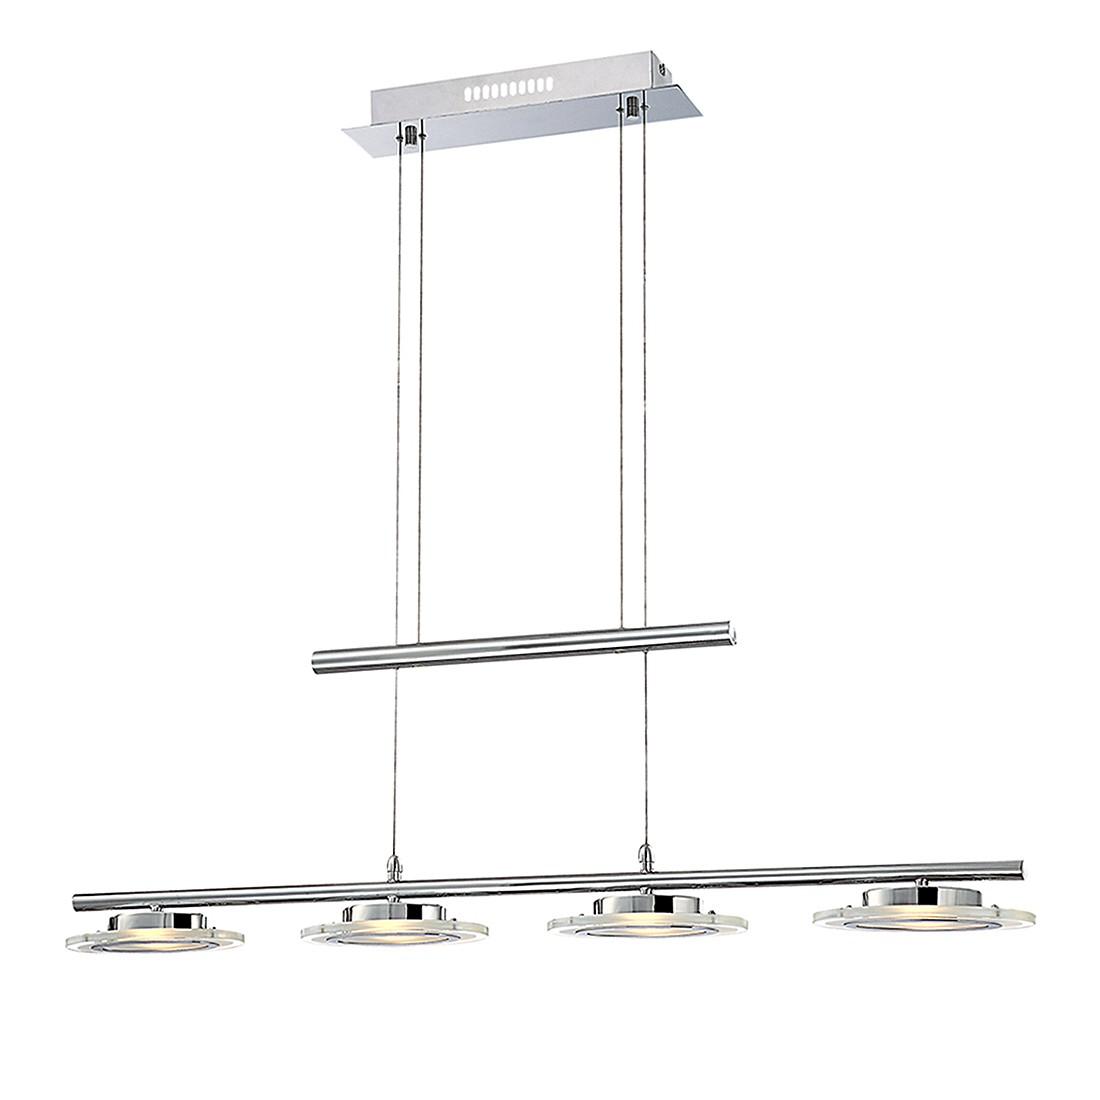 Hängeleuchte NESTOR I – Metall – Silber – 4-flammig, Globo Lighting günstig kaufen